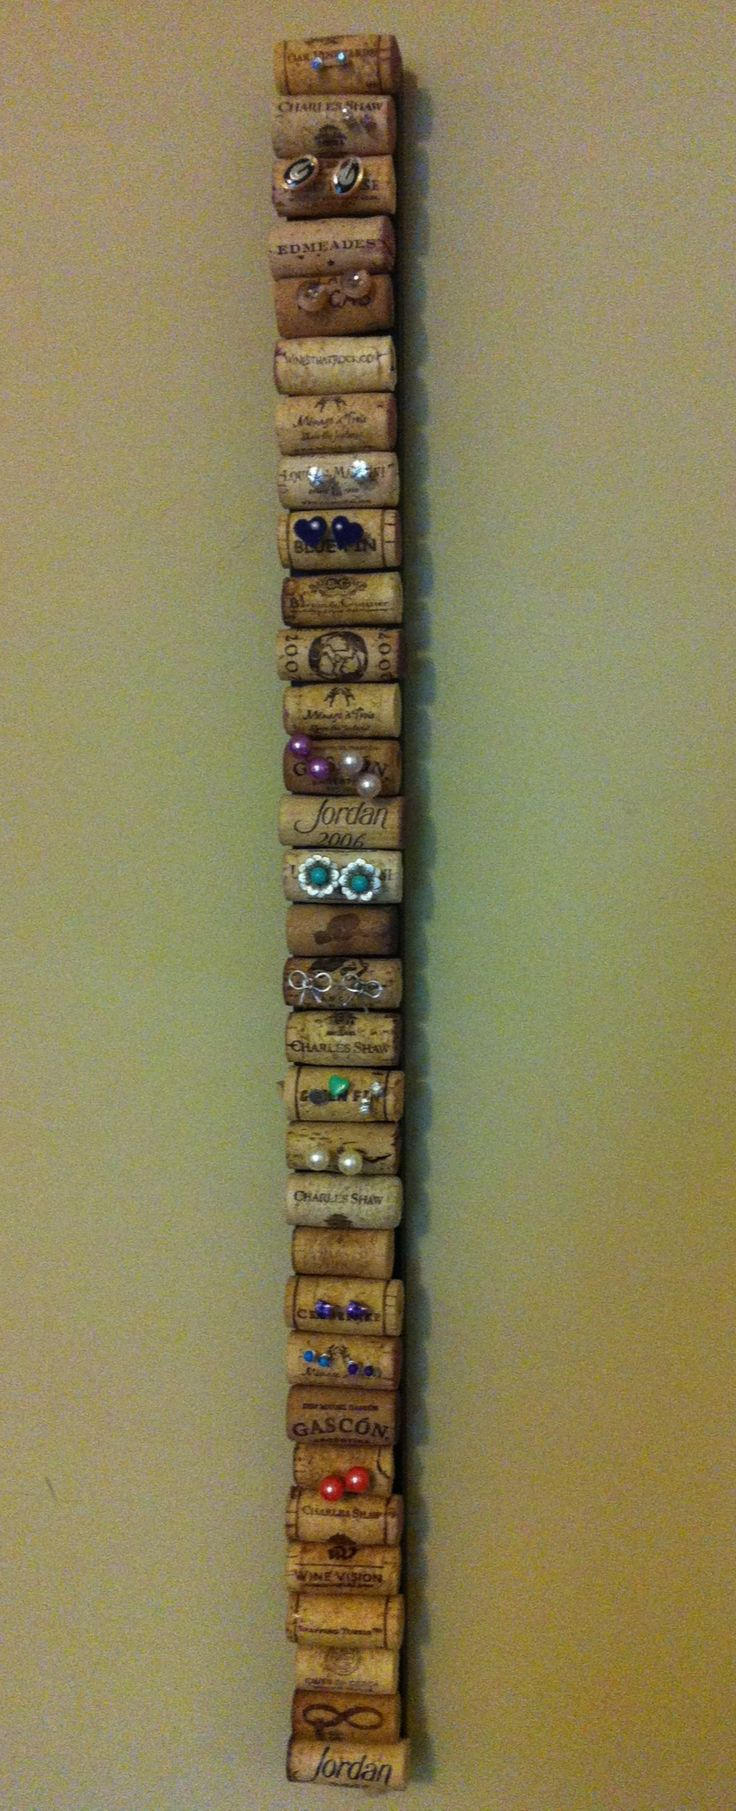 Post earring holder. Scrap wood, corks, hot glue